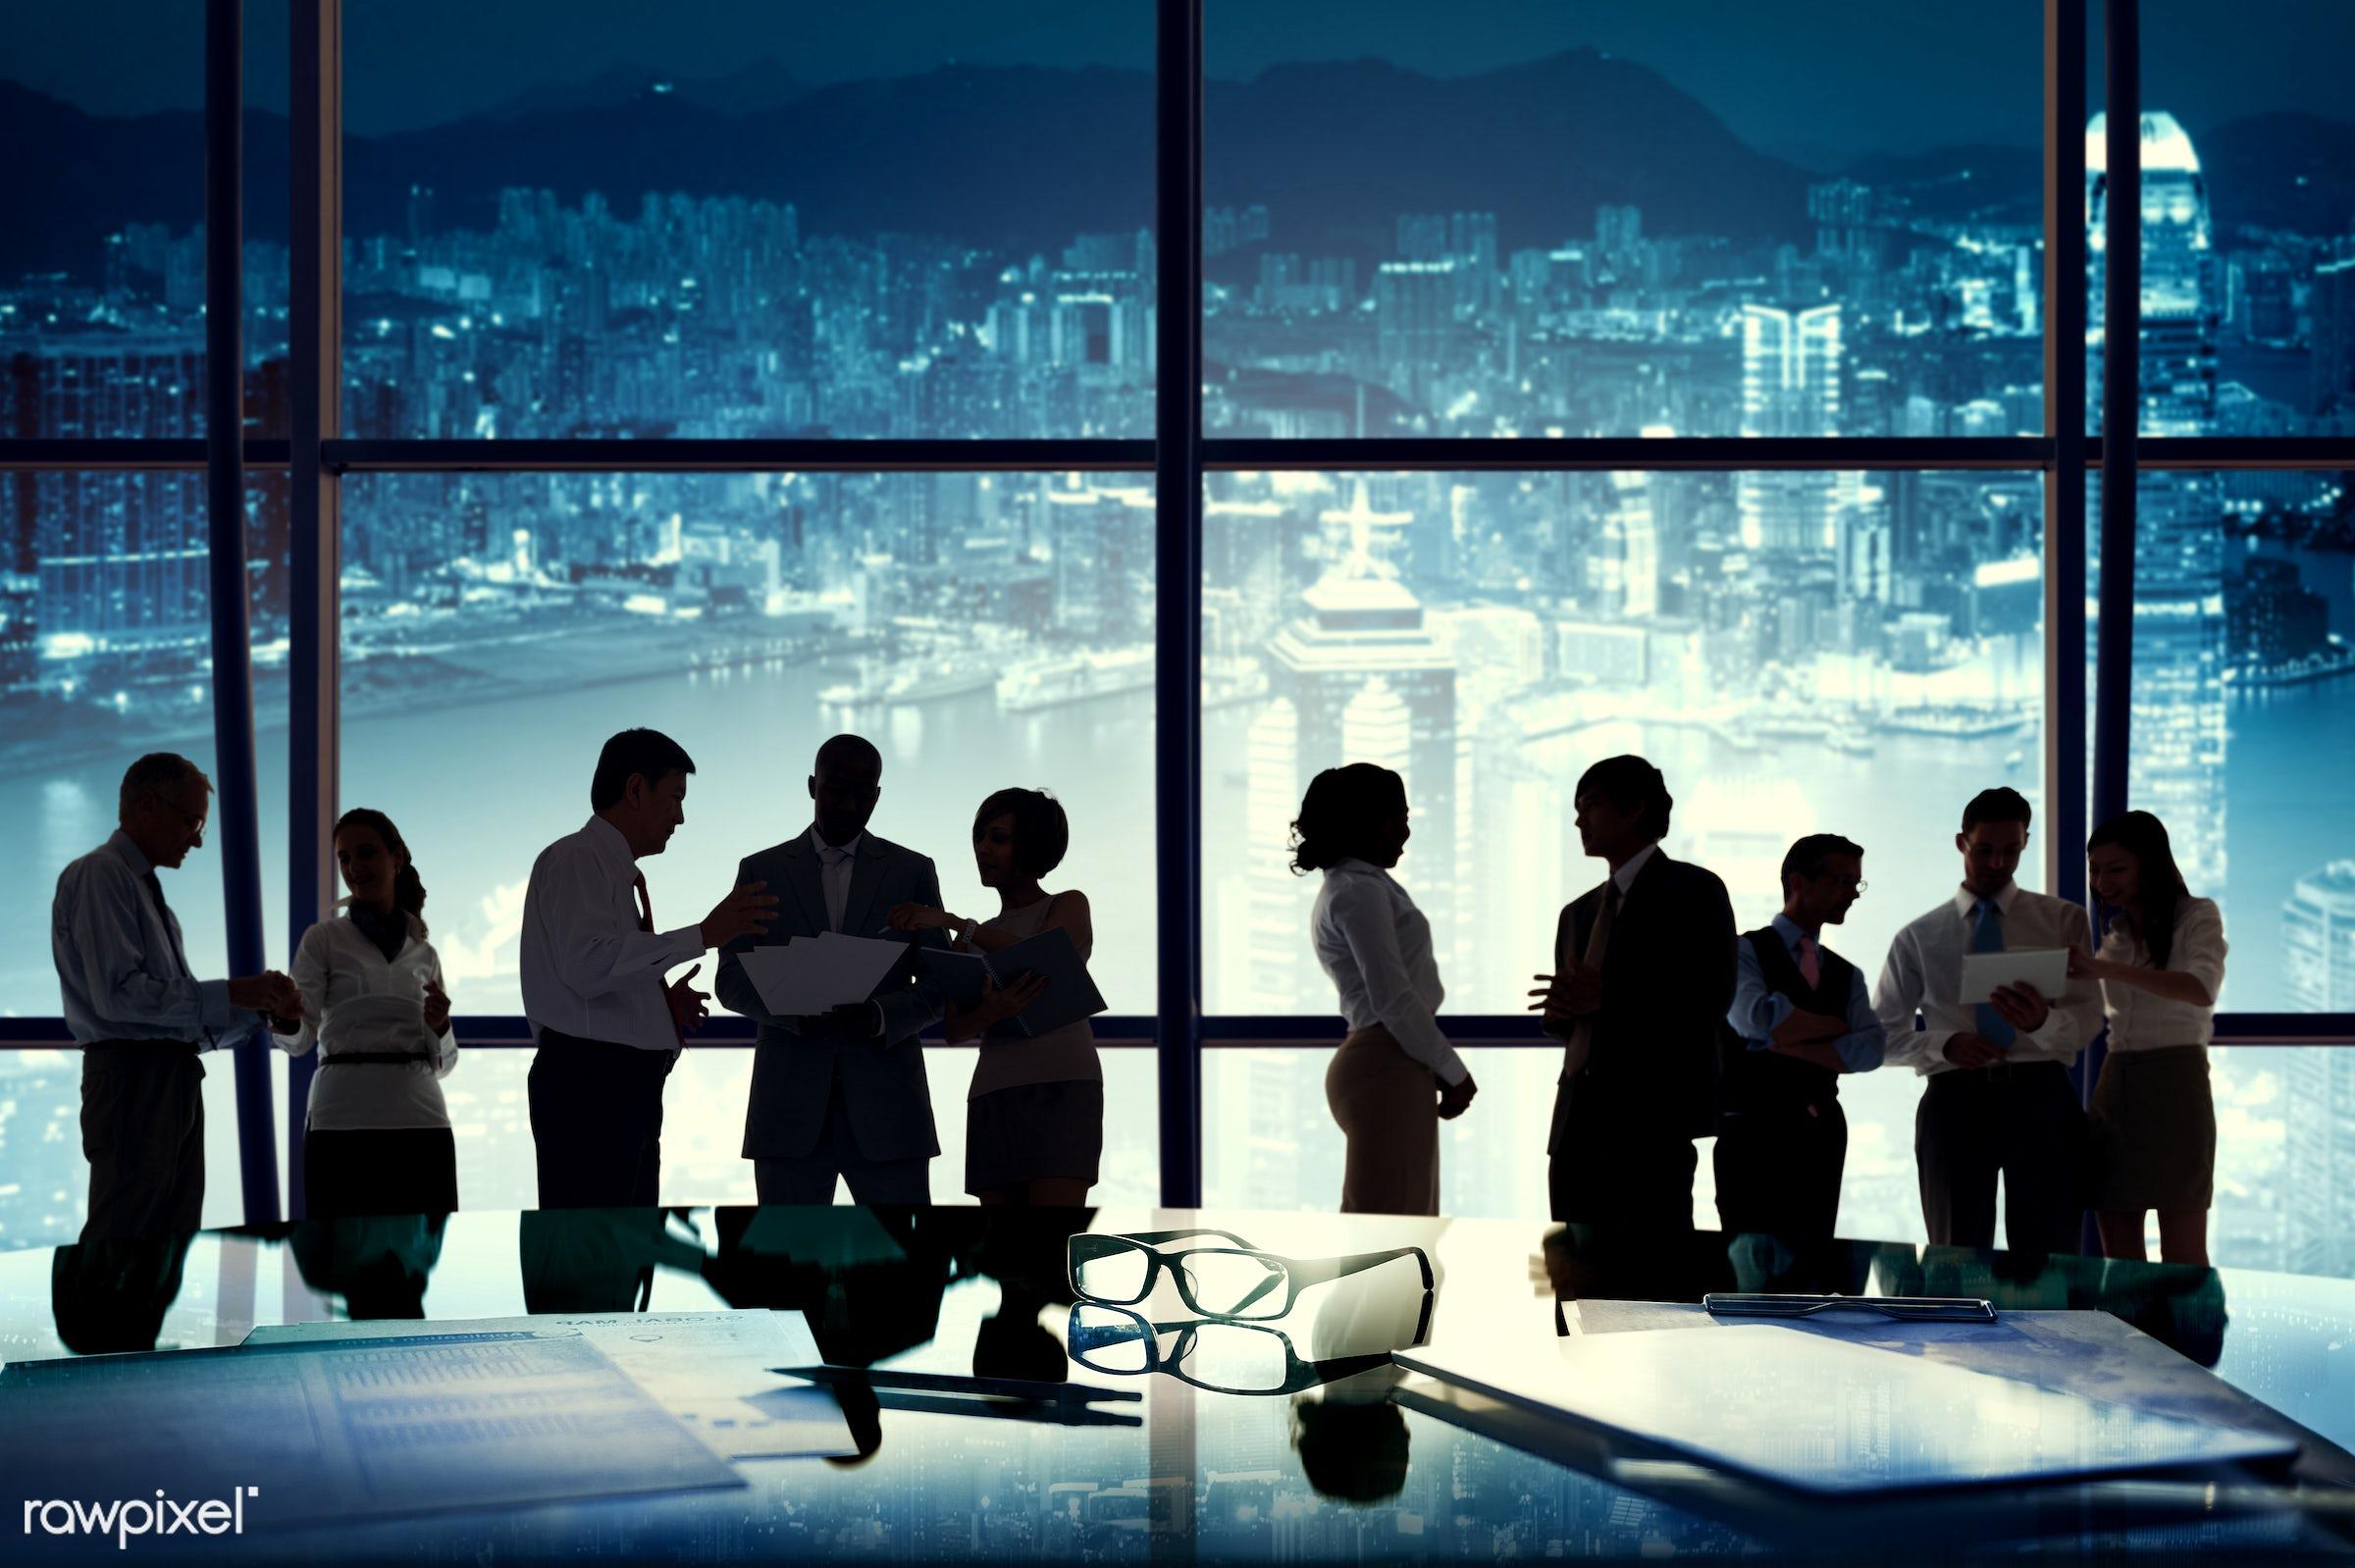 black, board room, brainstorming, building interior, business, business people, business person, businessman, businesswoman...